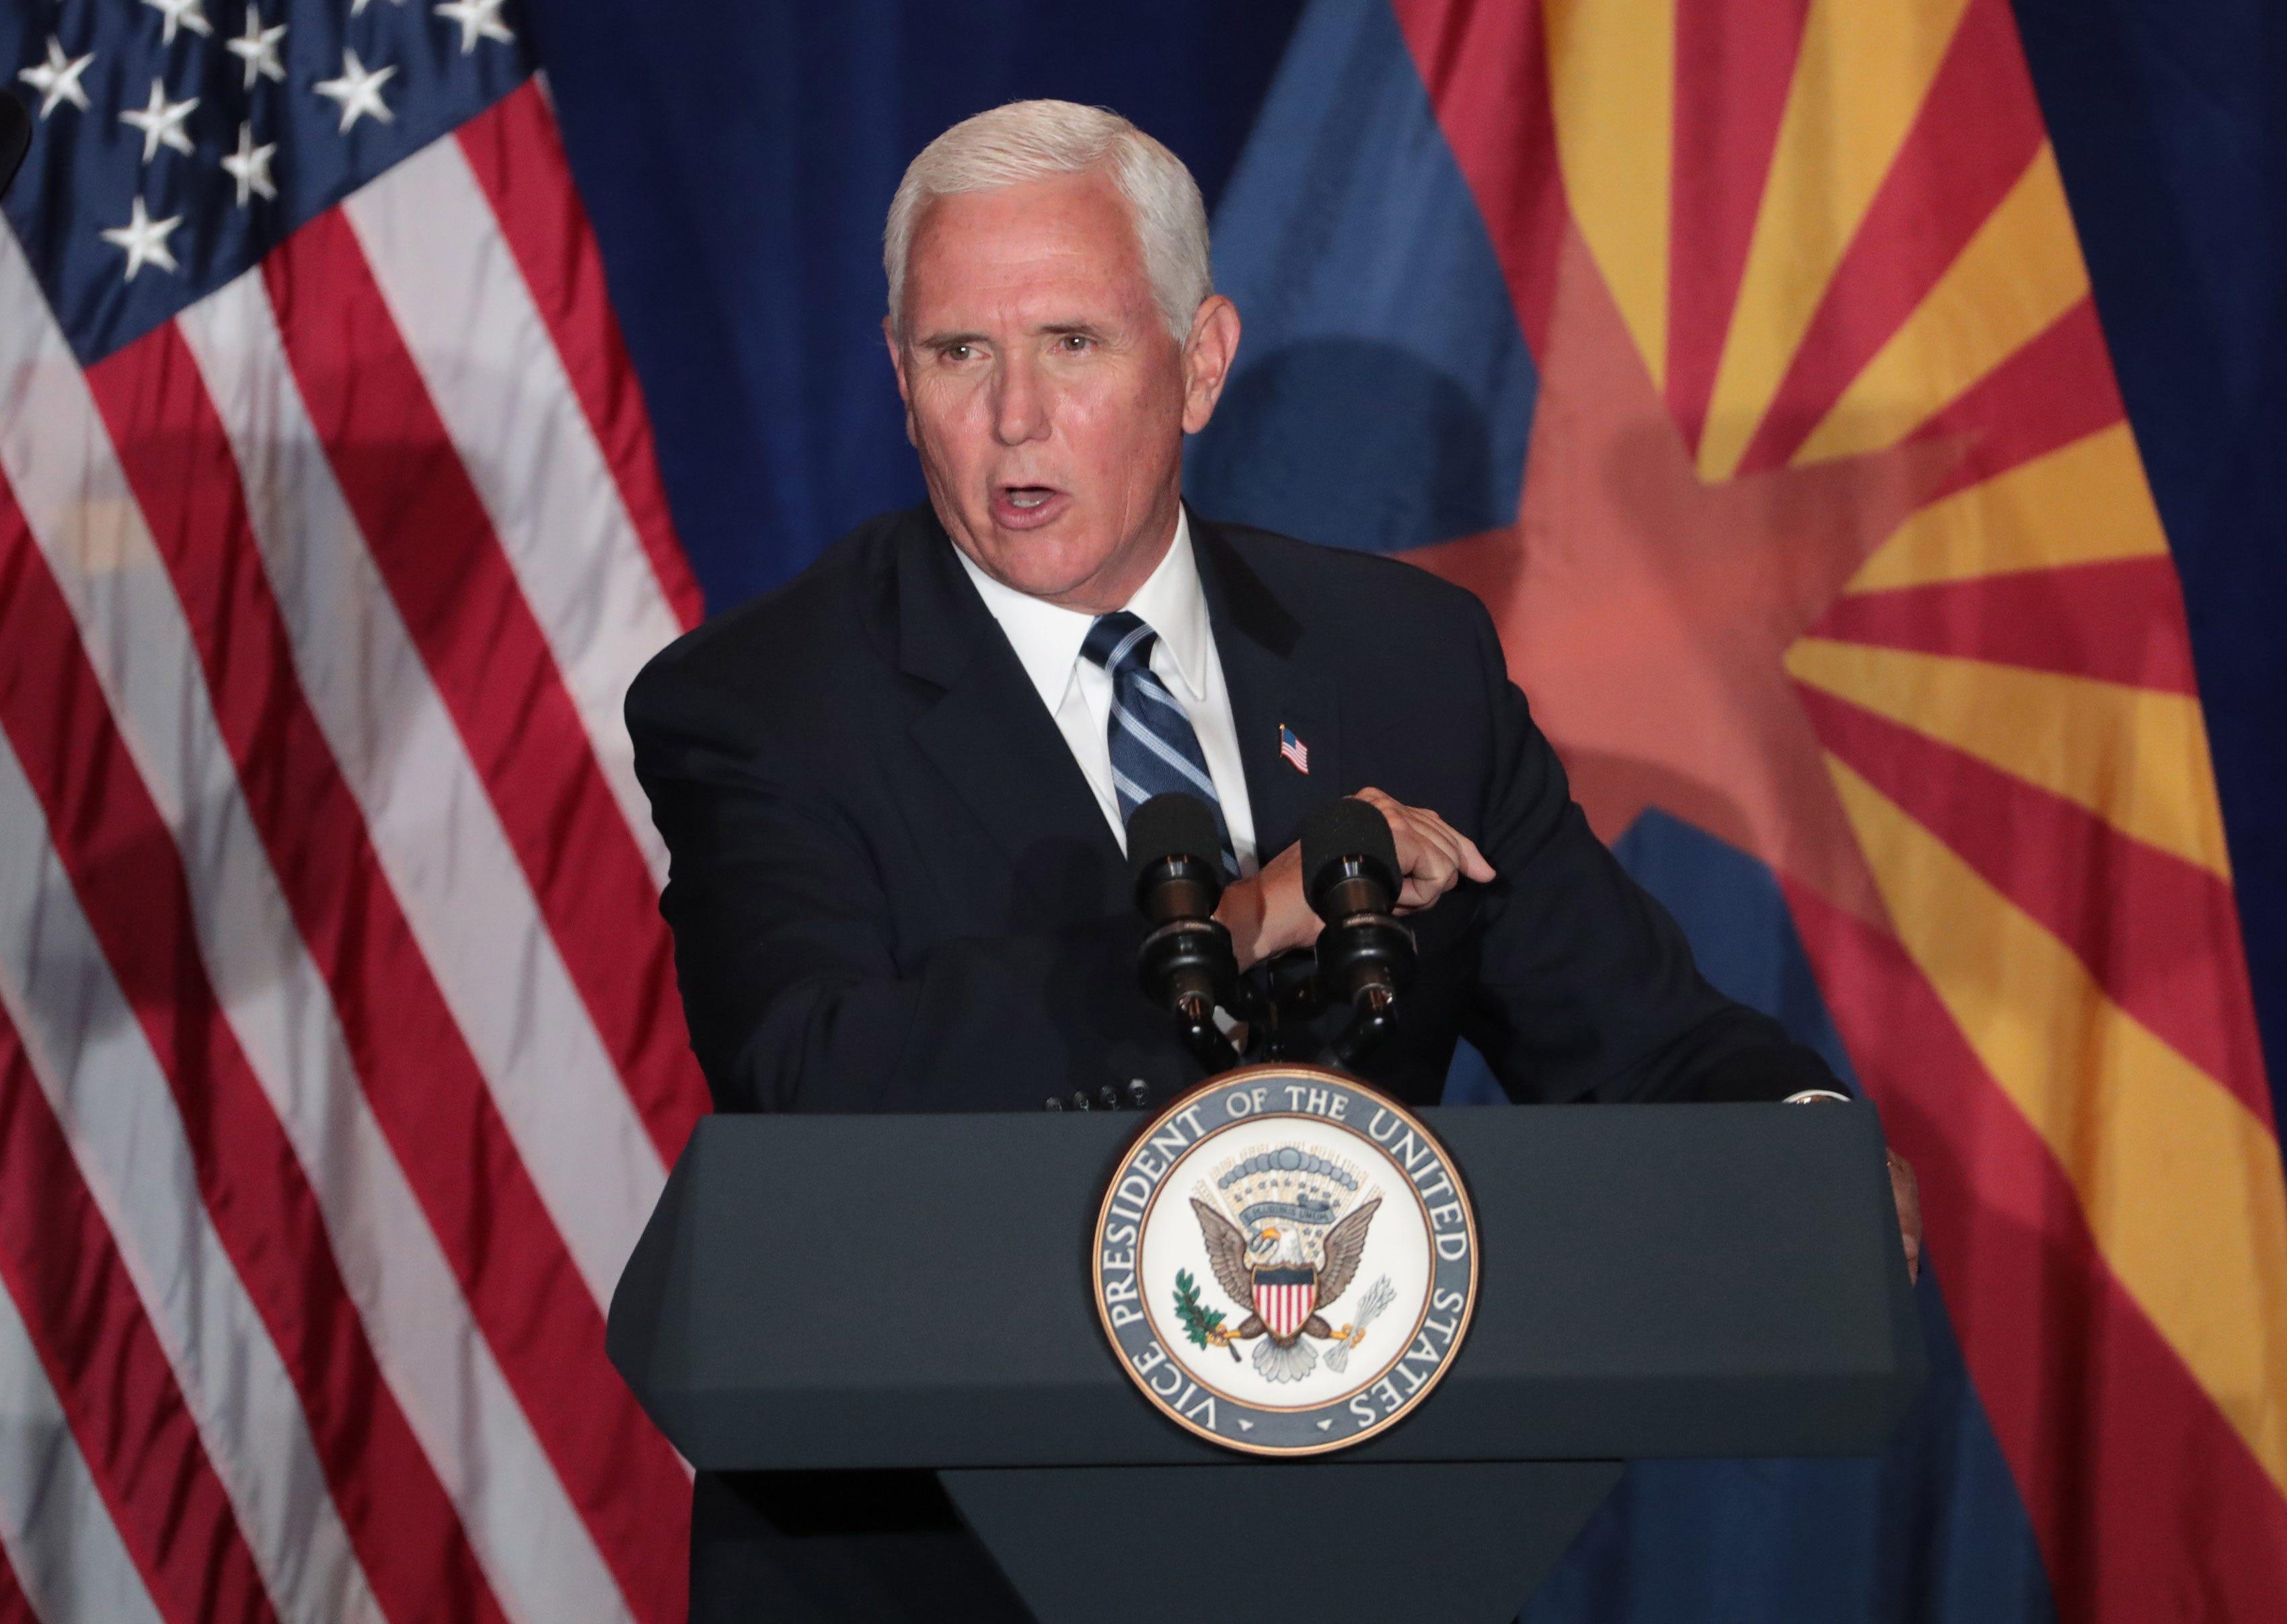 Vice President Mike Pence takes jab at Kamala Harris during Arizona visit